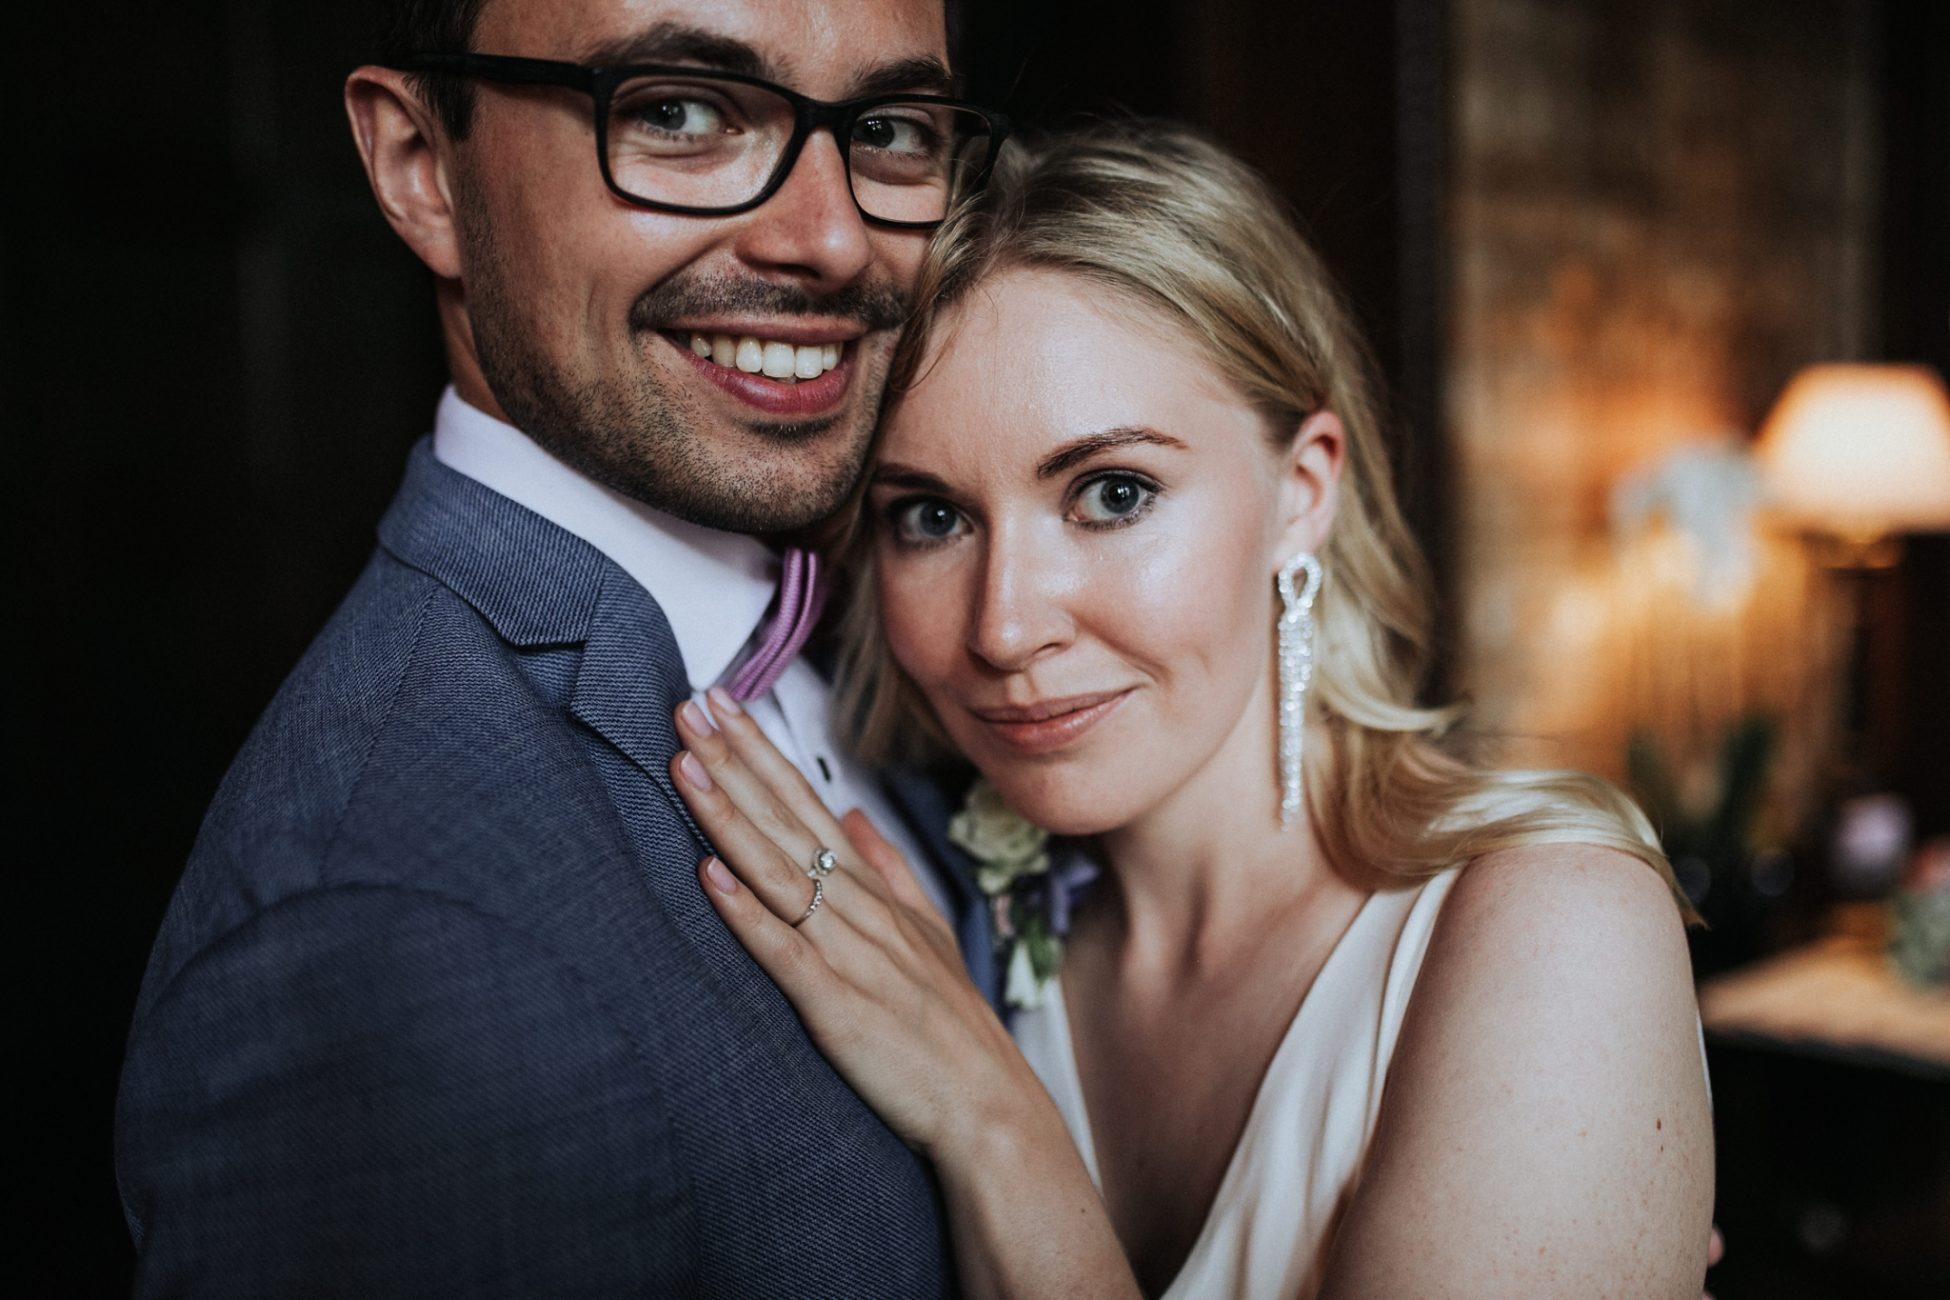 Schlosskirche Schöneieche HochzeitsfotografBerlin WeddingphotographerBerlin Standesamt PatrickHellmannSchlosshotel HochzeitsfotosBerlin Hochzeitslocation